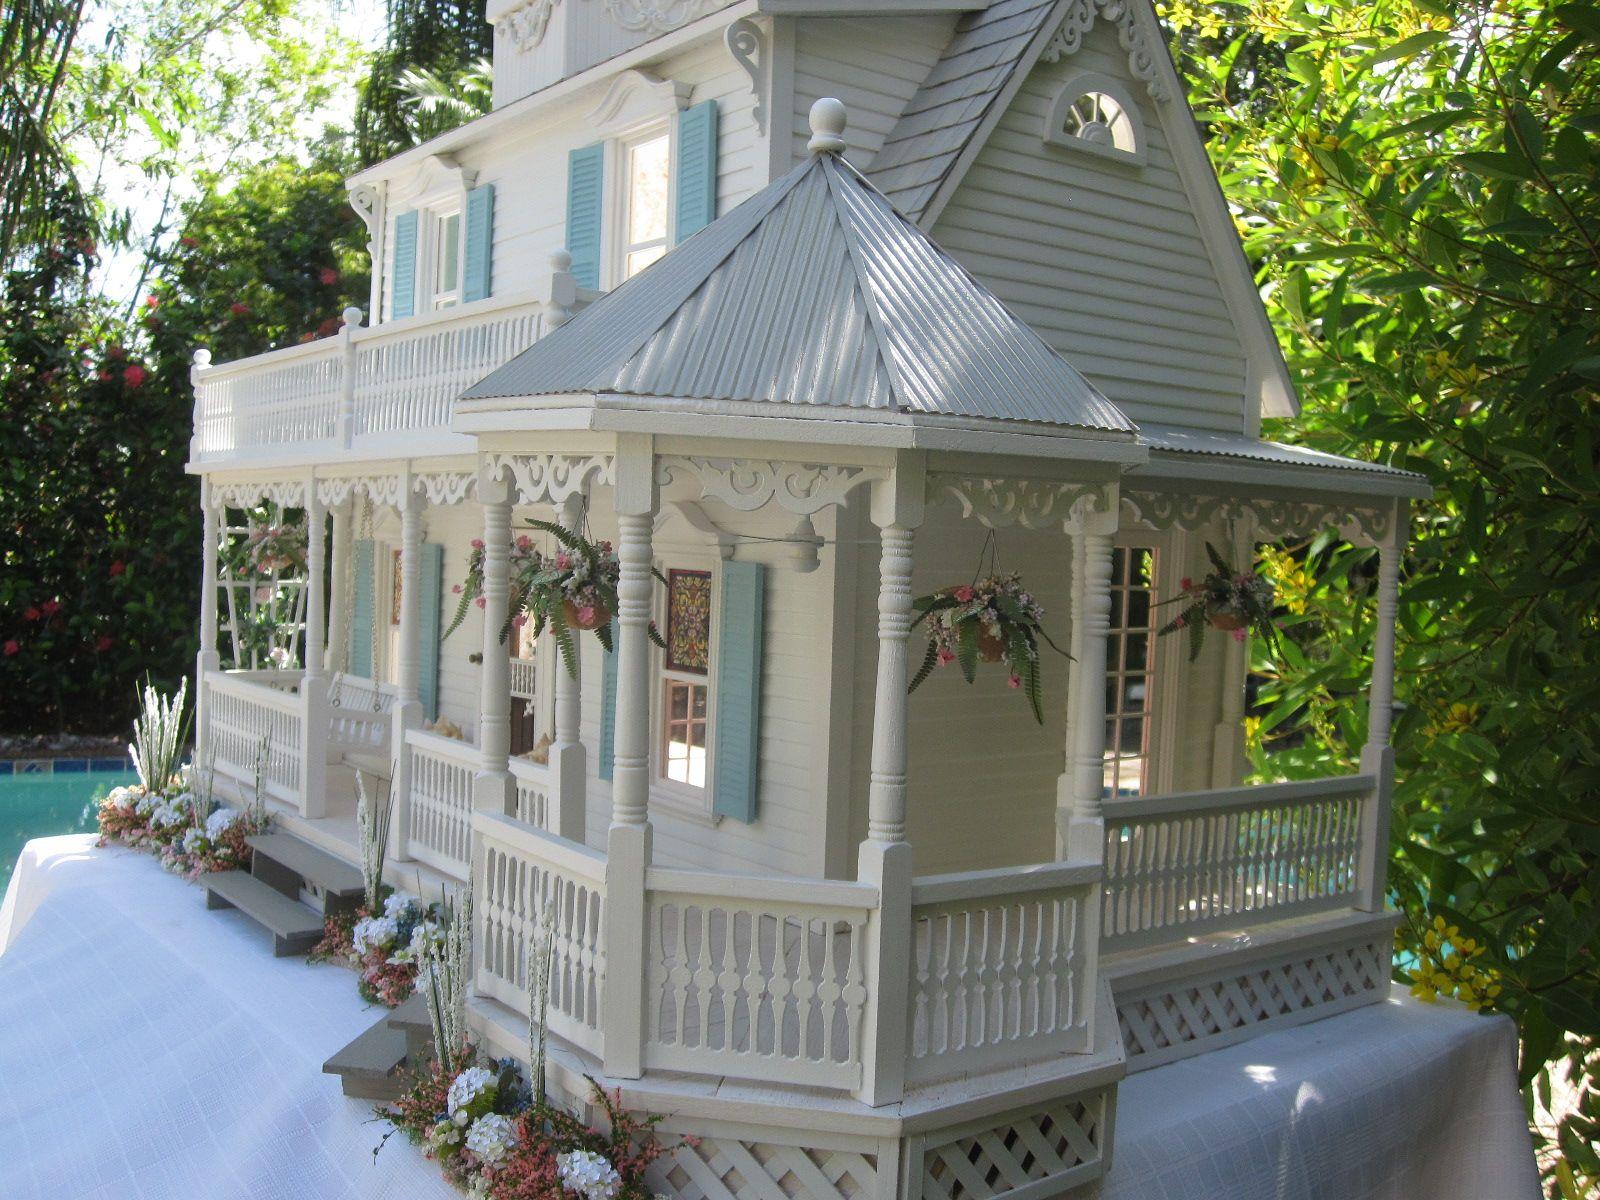 Victorian miniature houses - The Sea Glass Victorian Cottage Dollhouse This Is The Sea Glass Cottage Dollhouse My Vision For This House Was A Wonderful Light